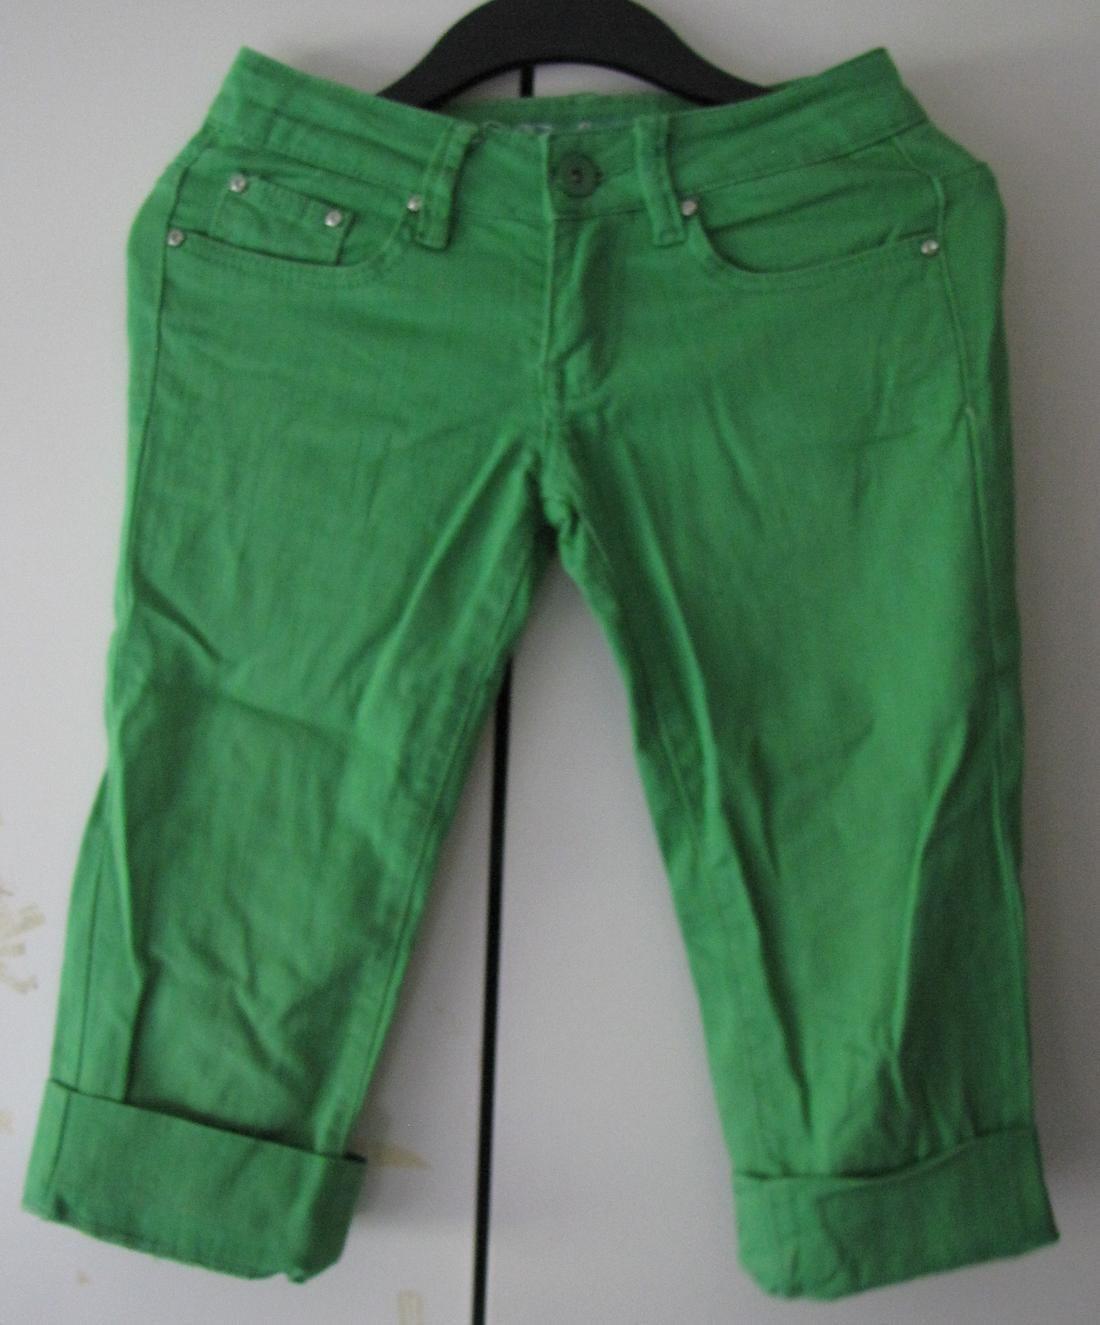 Gröna 3 4 långa shorts byxor jeans 5 fickor sil.. (340884996) ᐈ Köp ... df6845d2ae096